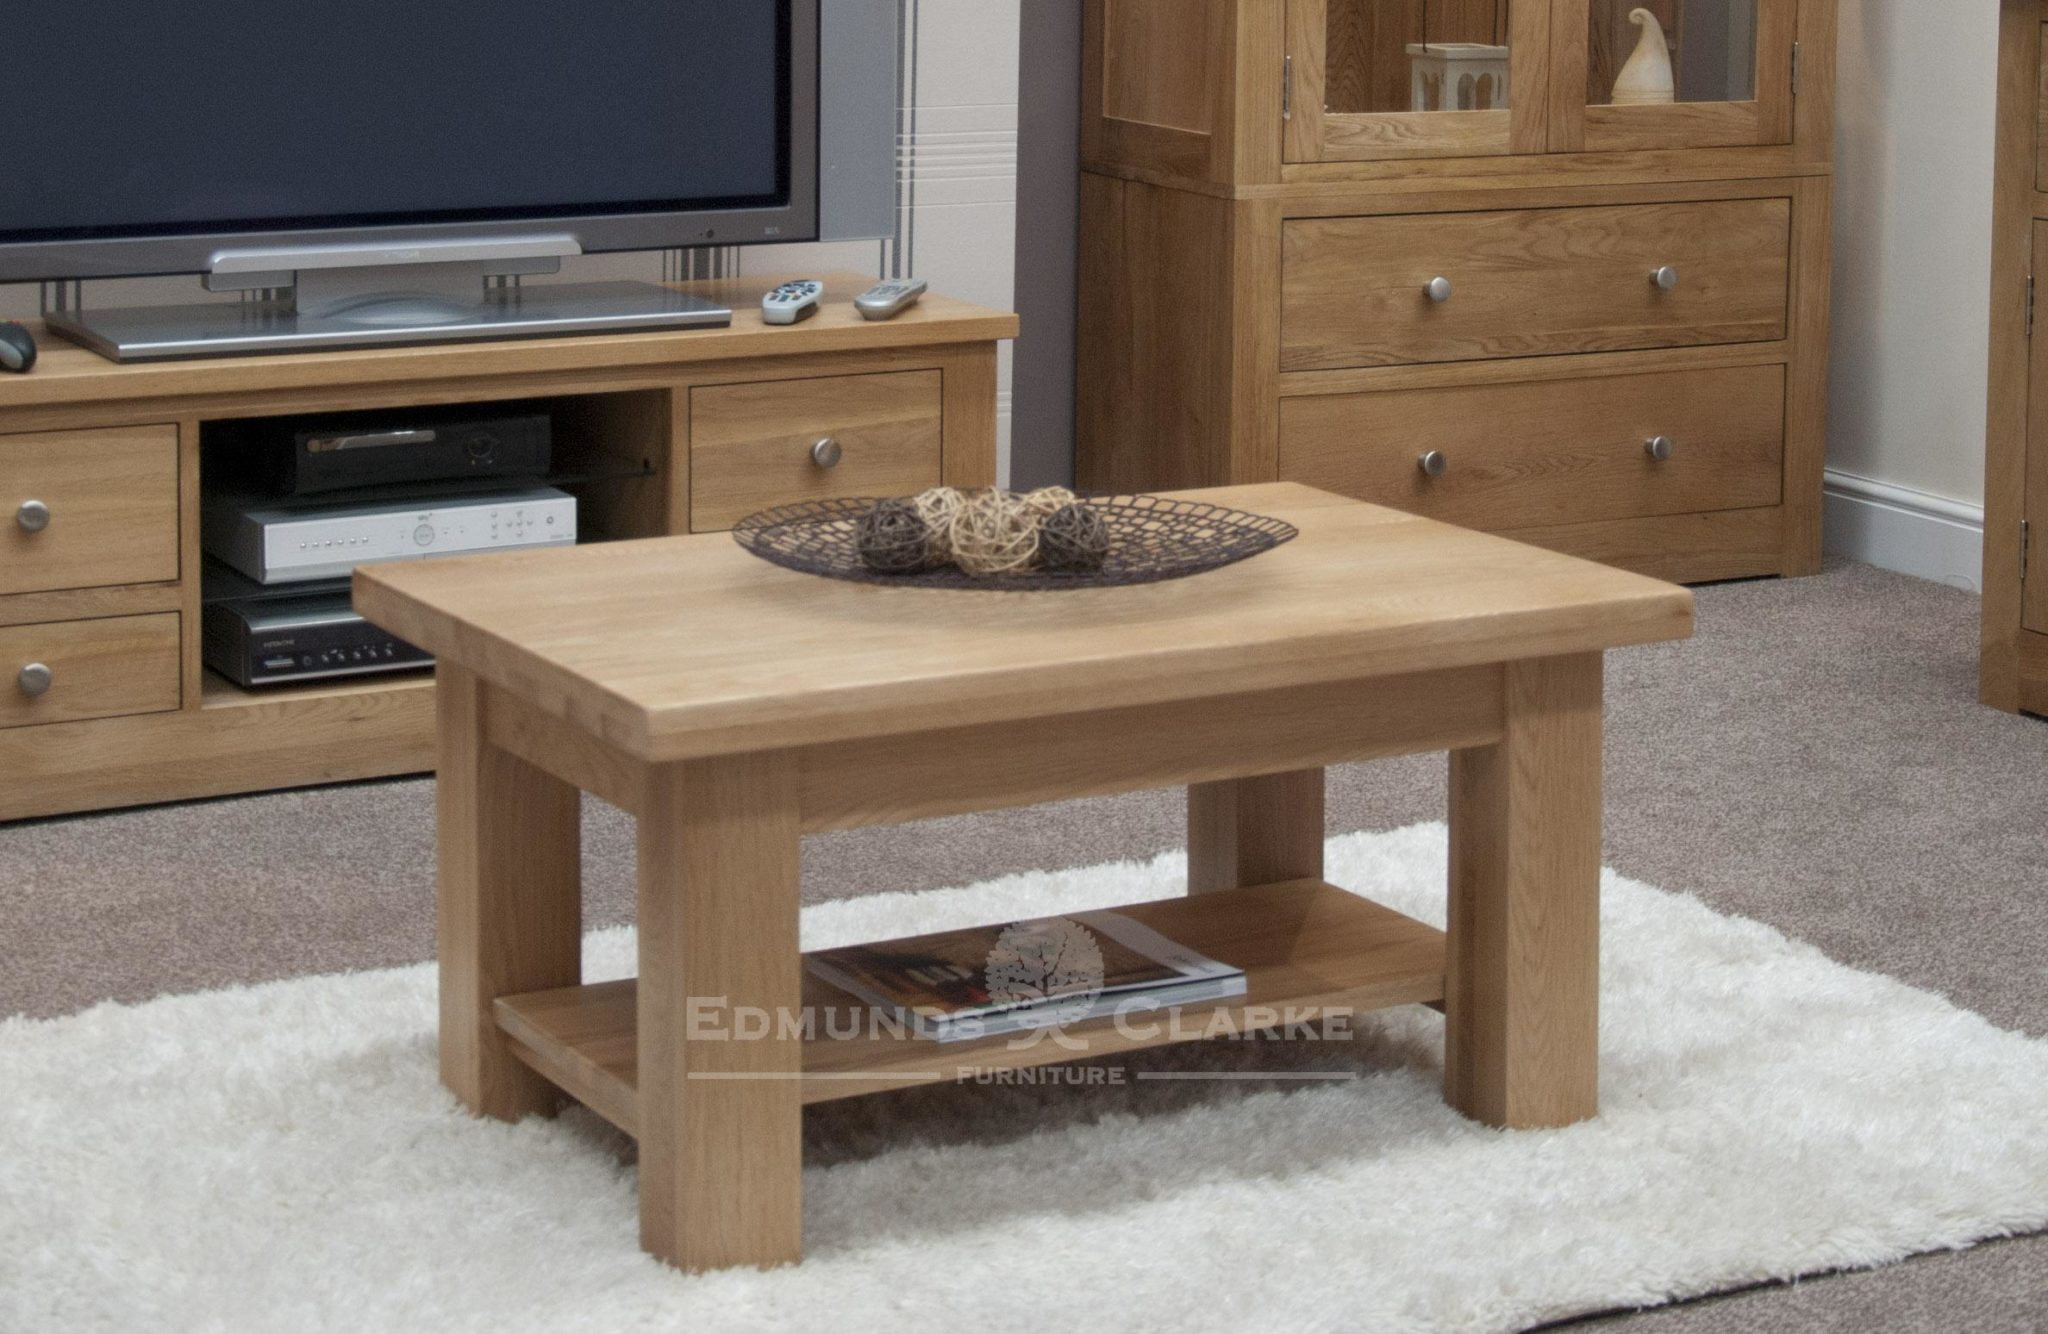 solid oak chunky square leg coffee table with magazine shelf, 3 feet by 2 feet